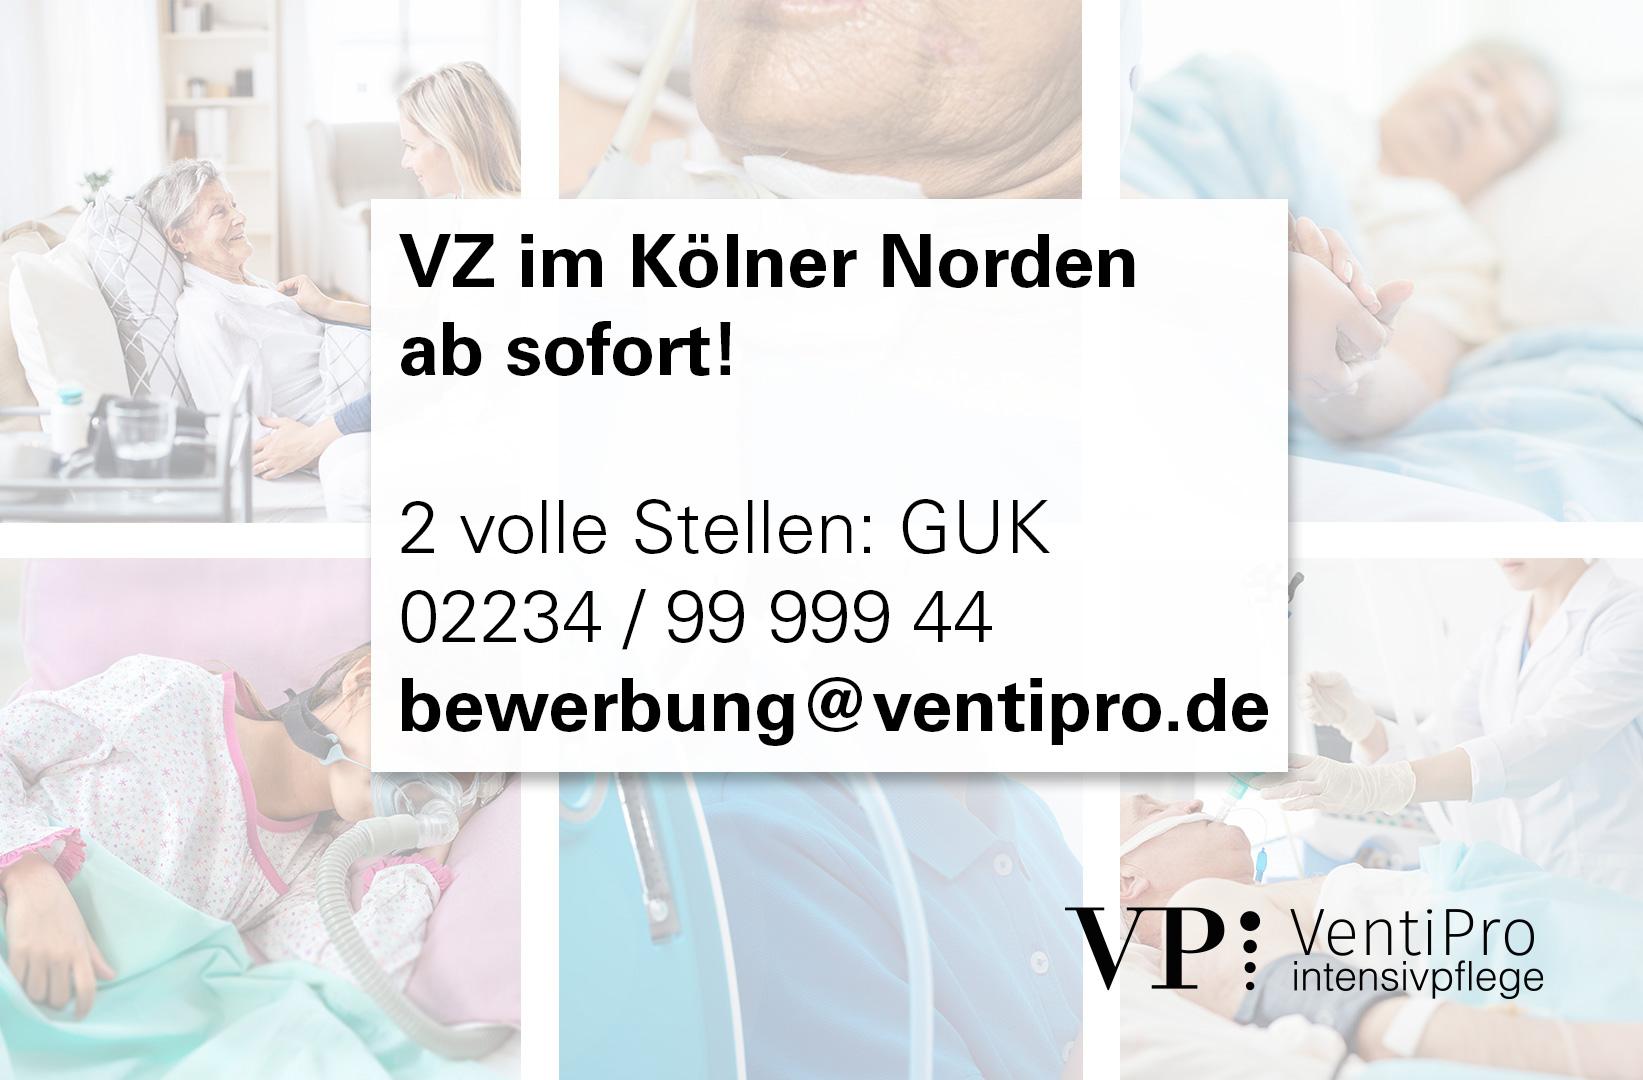 VZ Kölner Norden, Weiler (m|w|d) ab sofort